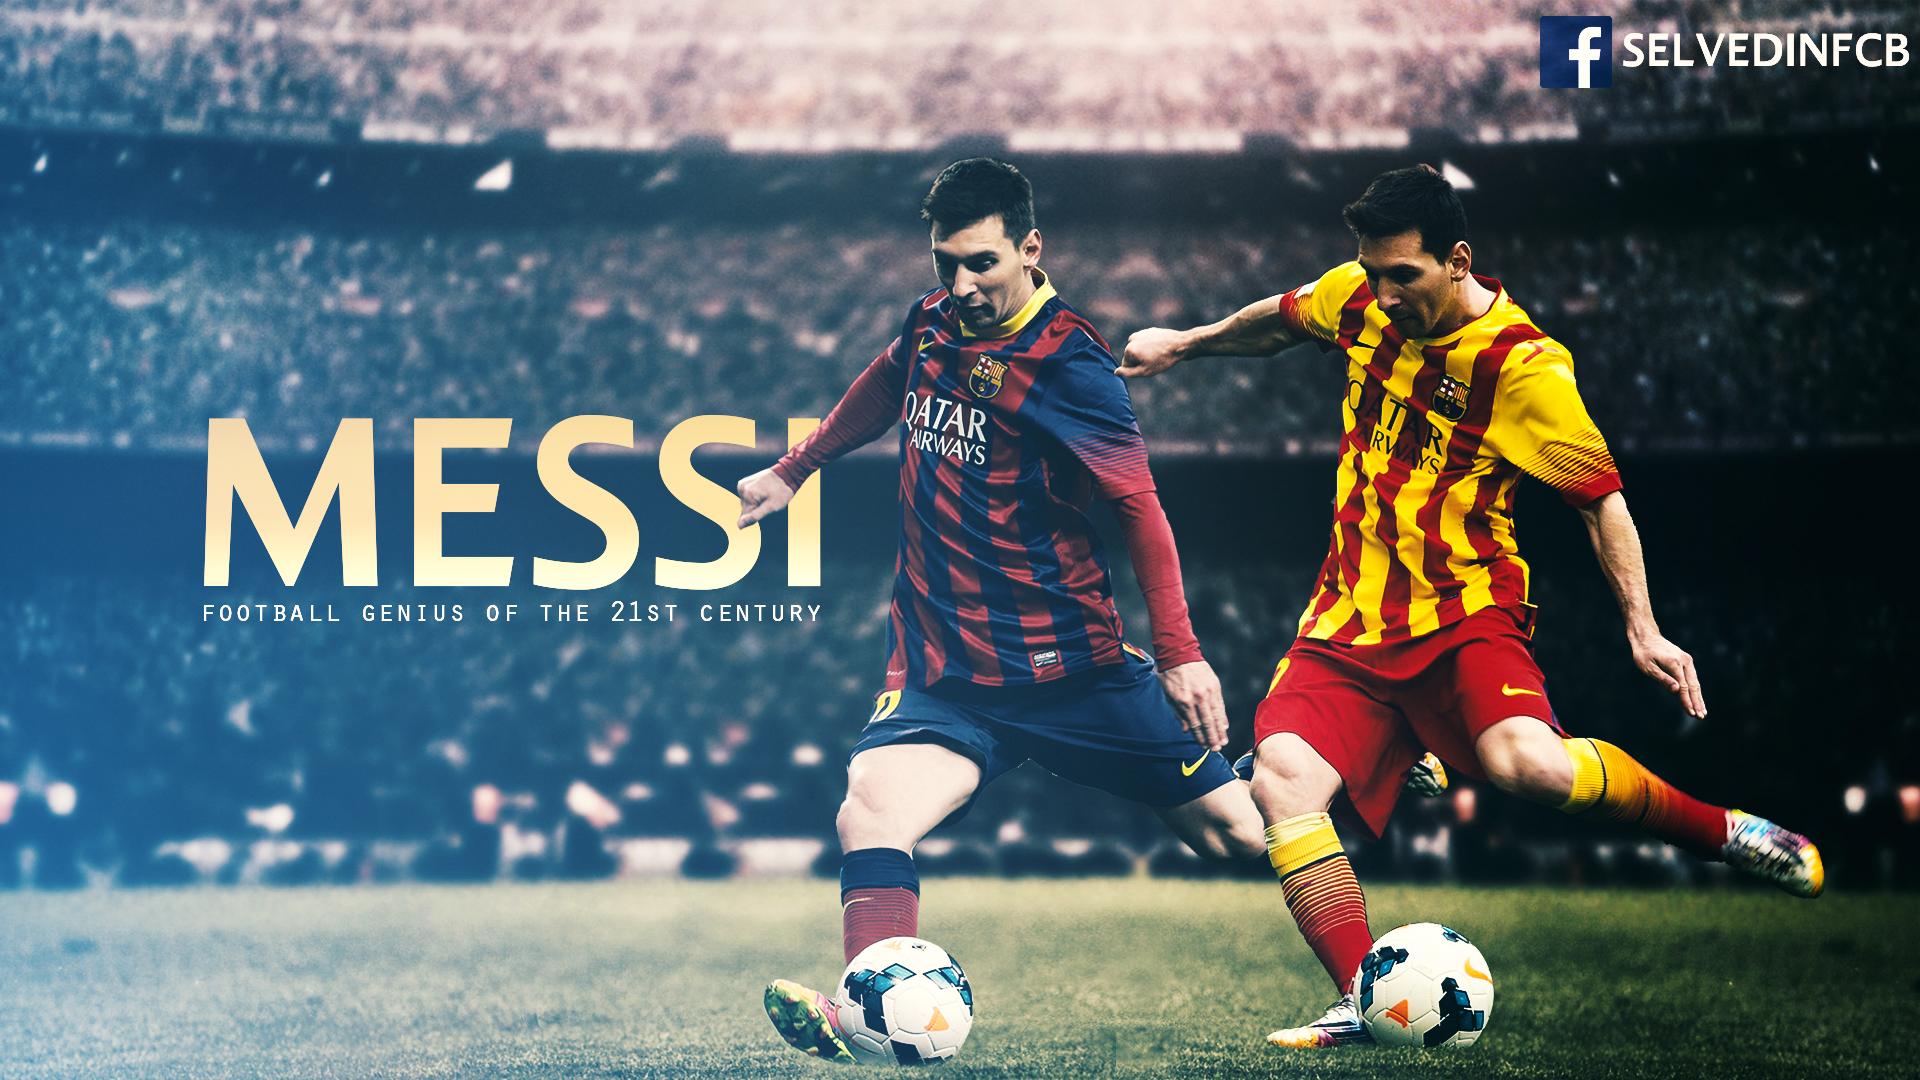 Messi Wallpaper soccer